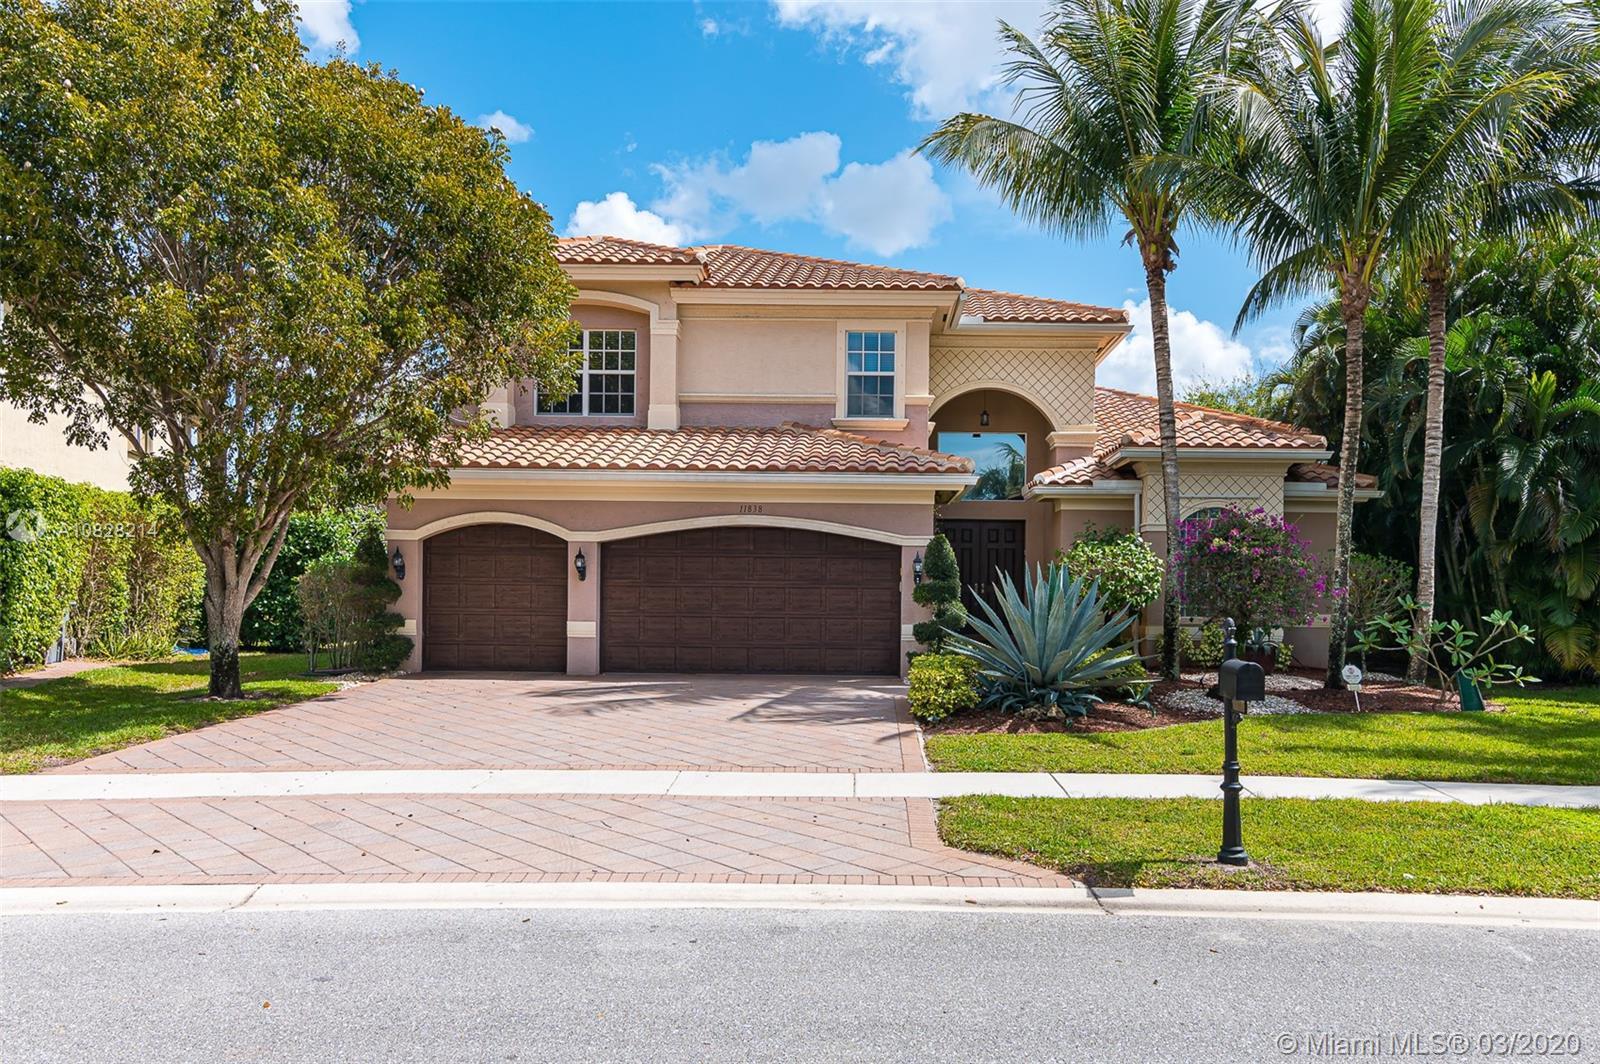 11838 Foxbriar Lake Trl Property Photo - Boynton Beach, FL real estate listing